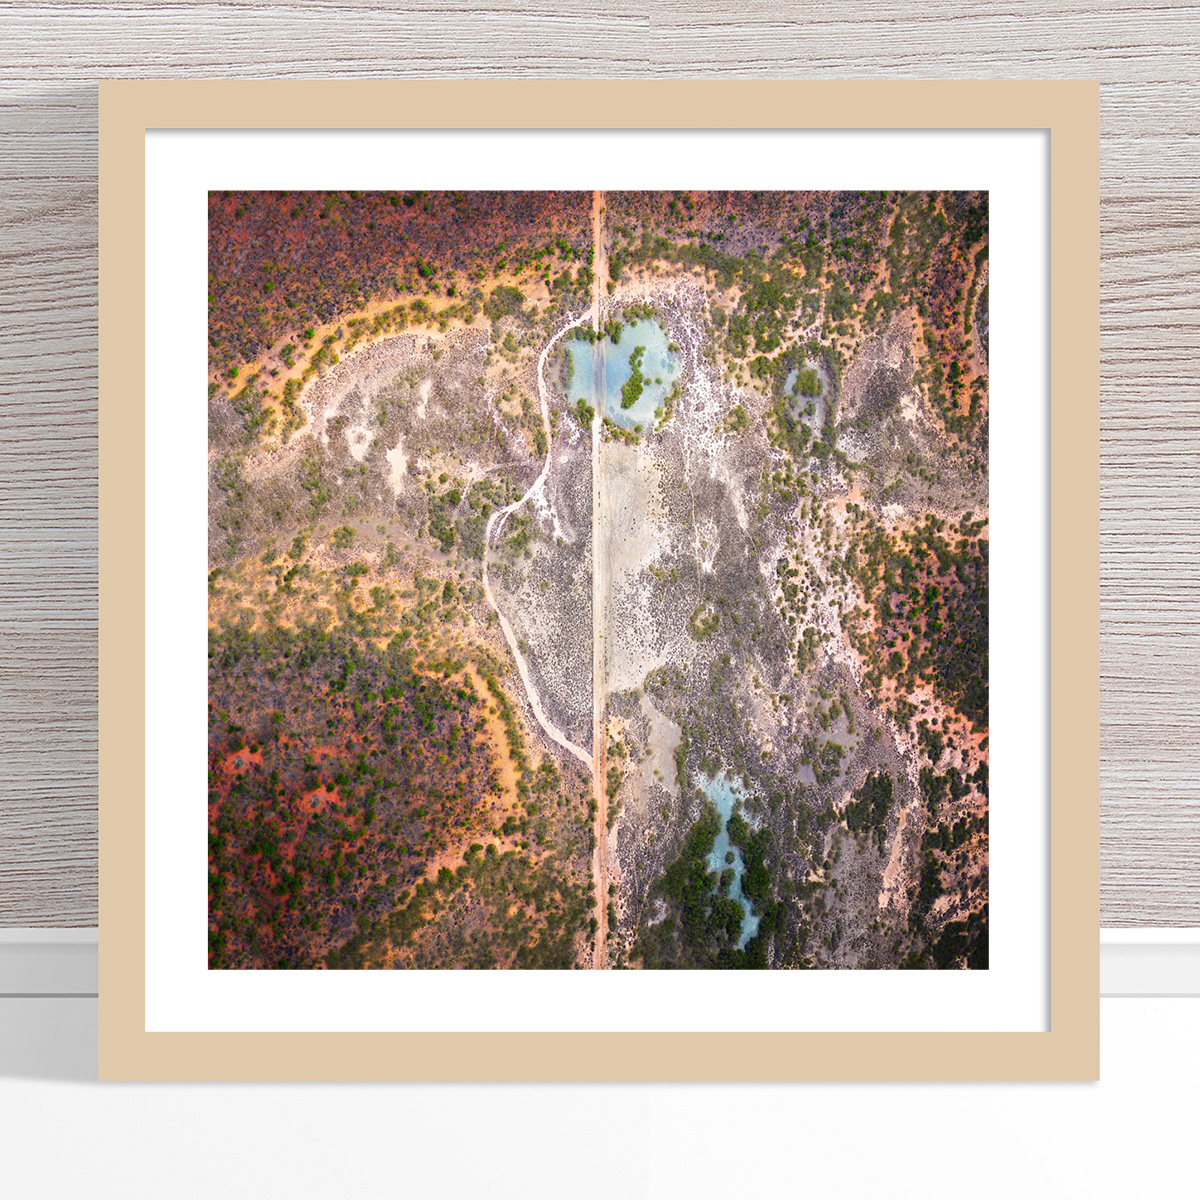 Chris Saunders - 'Aerial Outback 001' Light Frame